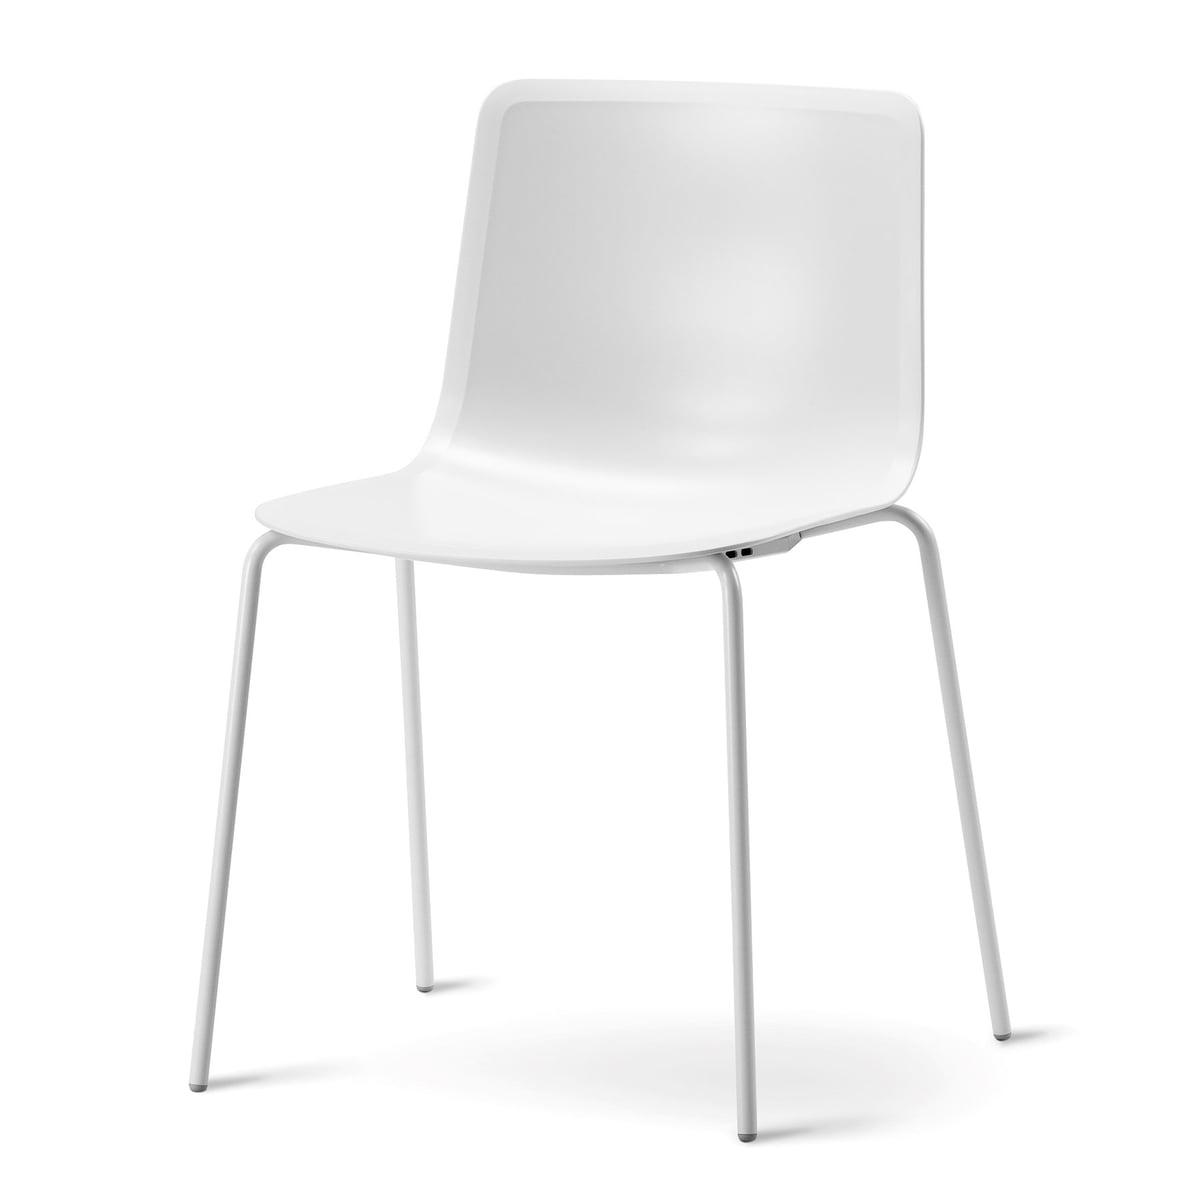 Fredericia Furniture A/S Fredericia - Chaise Pato à quatre pieds, blanc /blanc